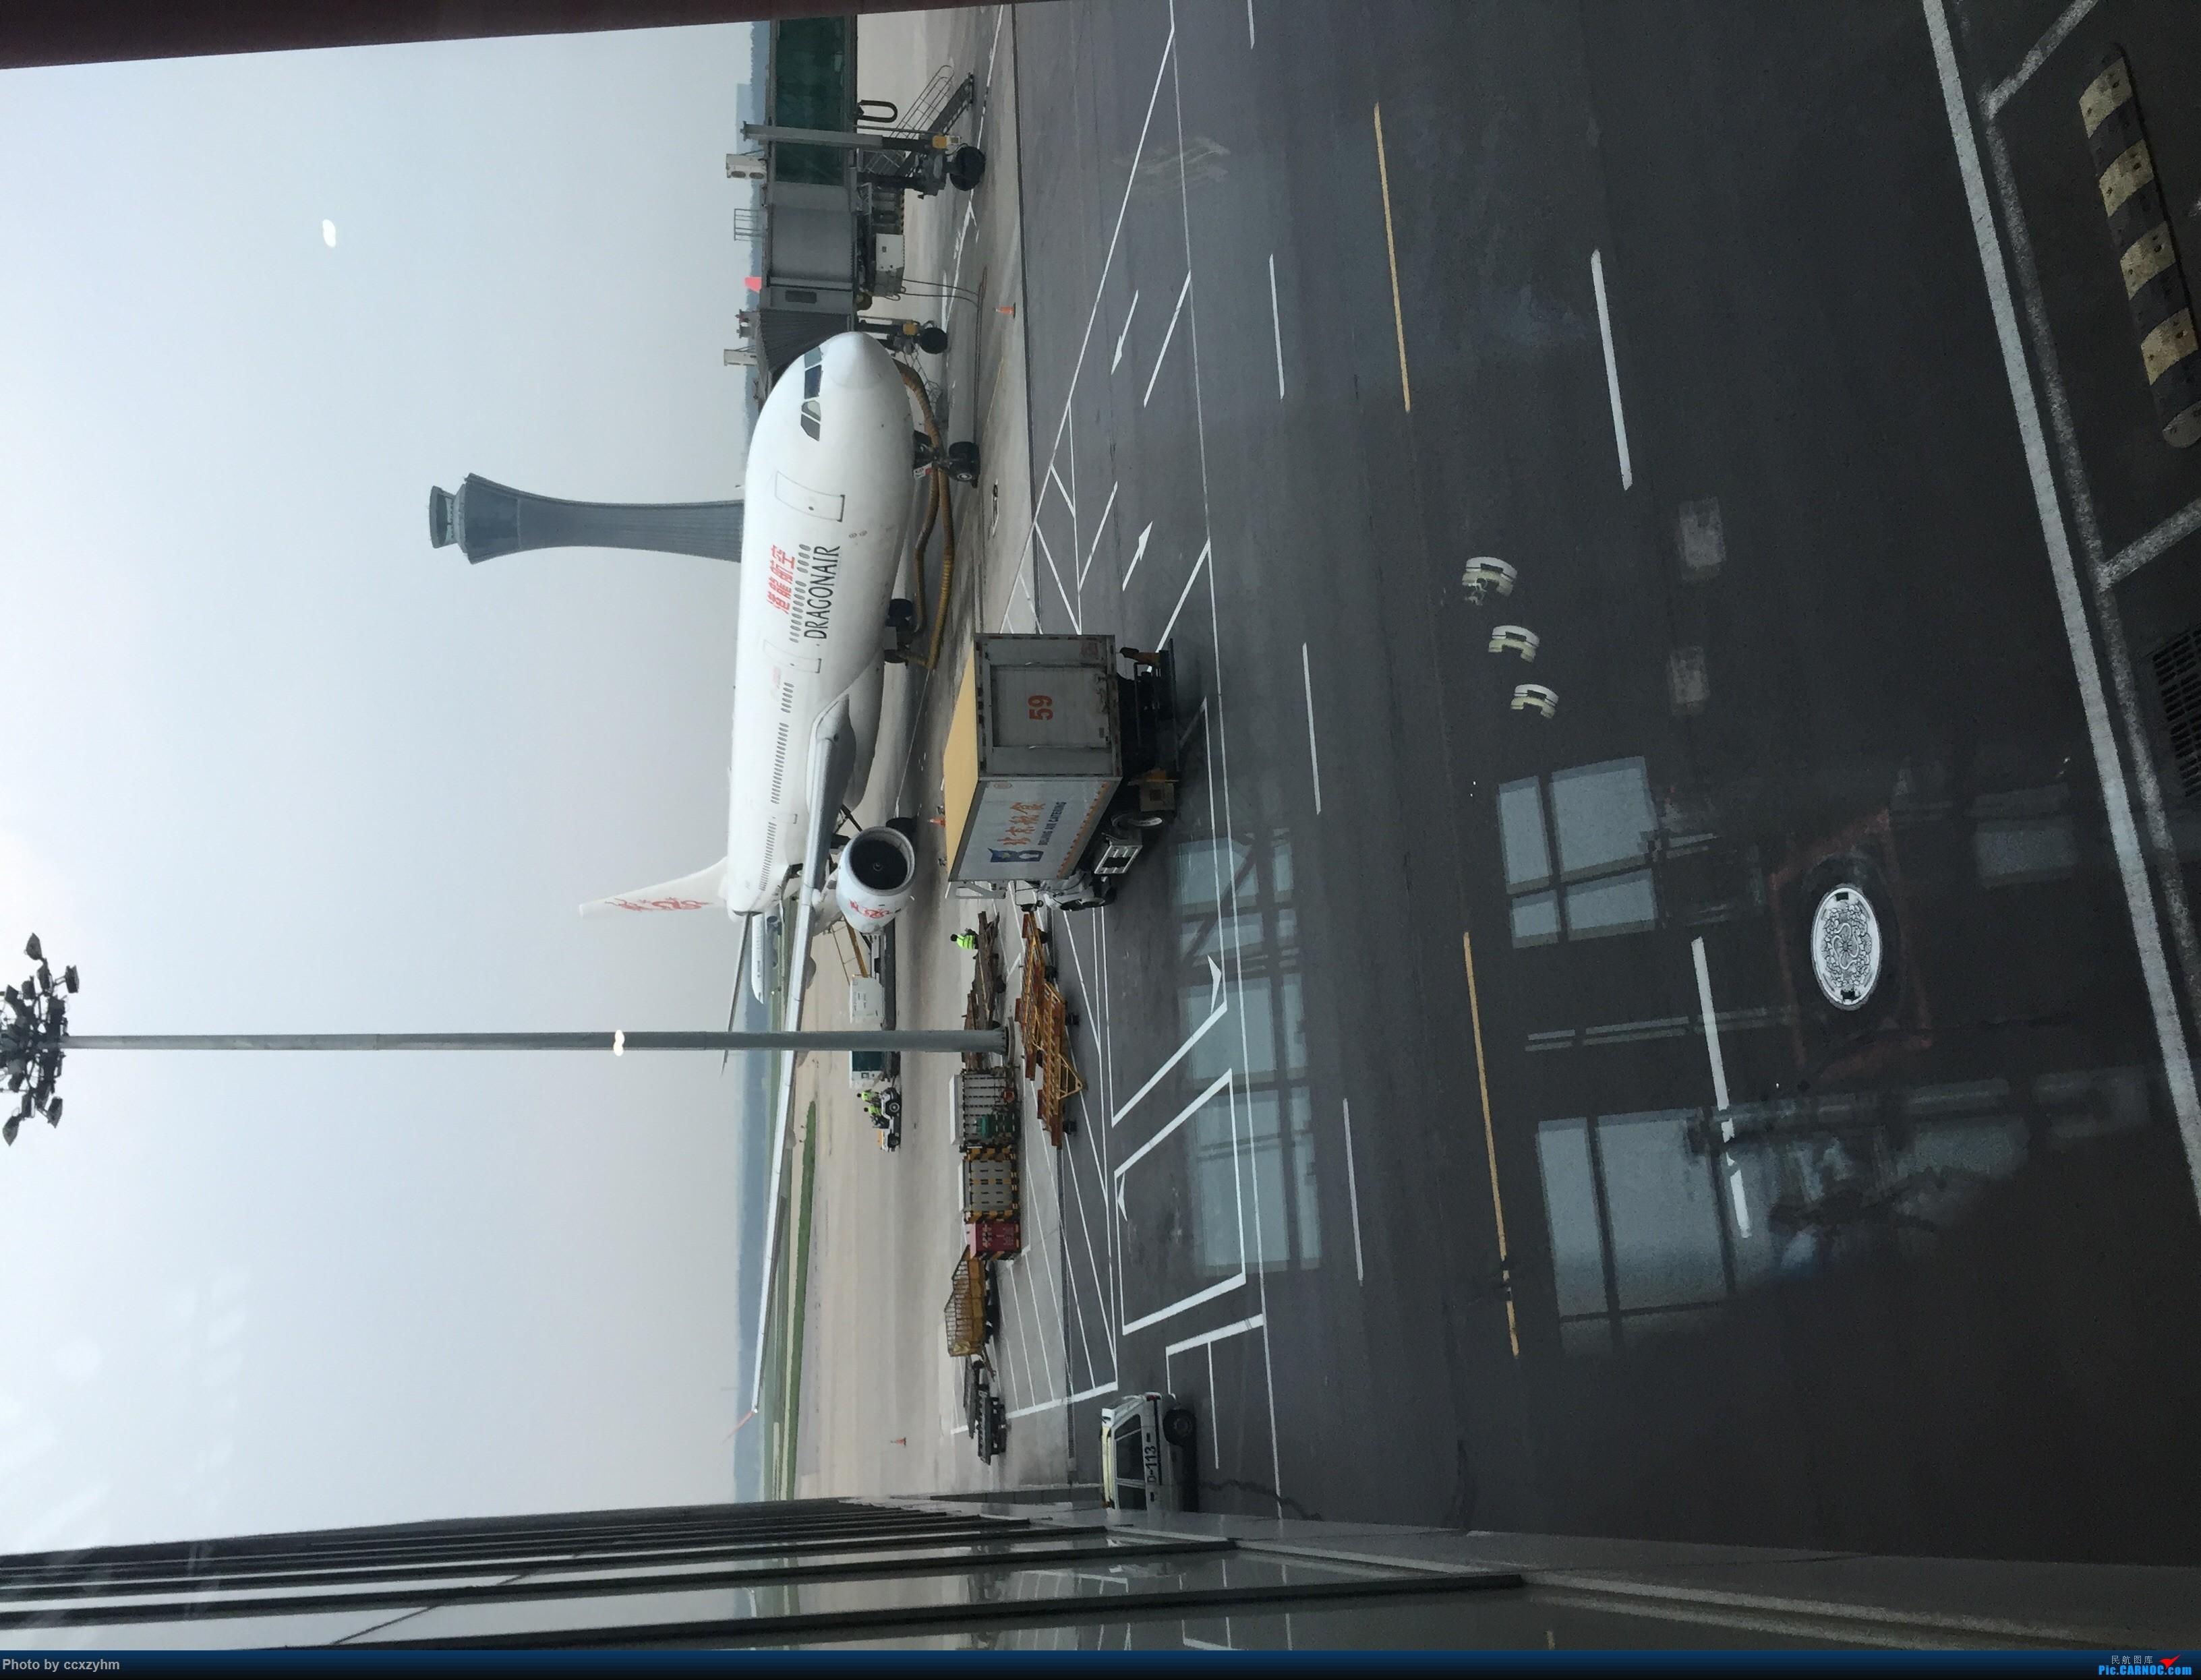 Re:[原创]PEK-HKG-SIN 港龙+国泰 KA+CX 暑假游坡县 AIRBUS A330-300  PEK